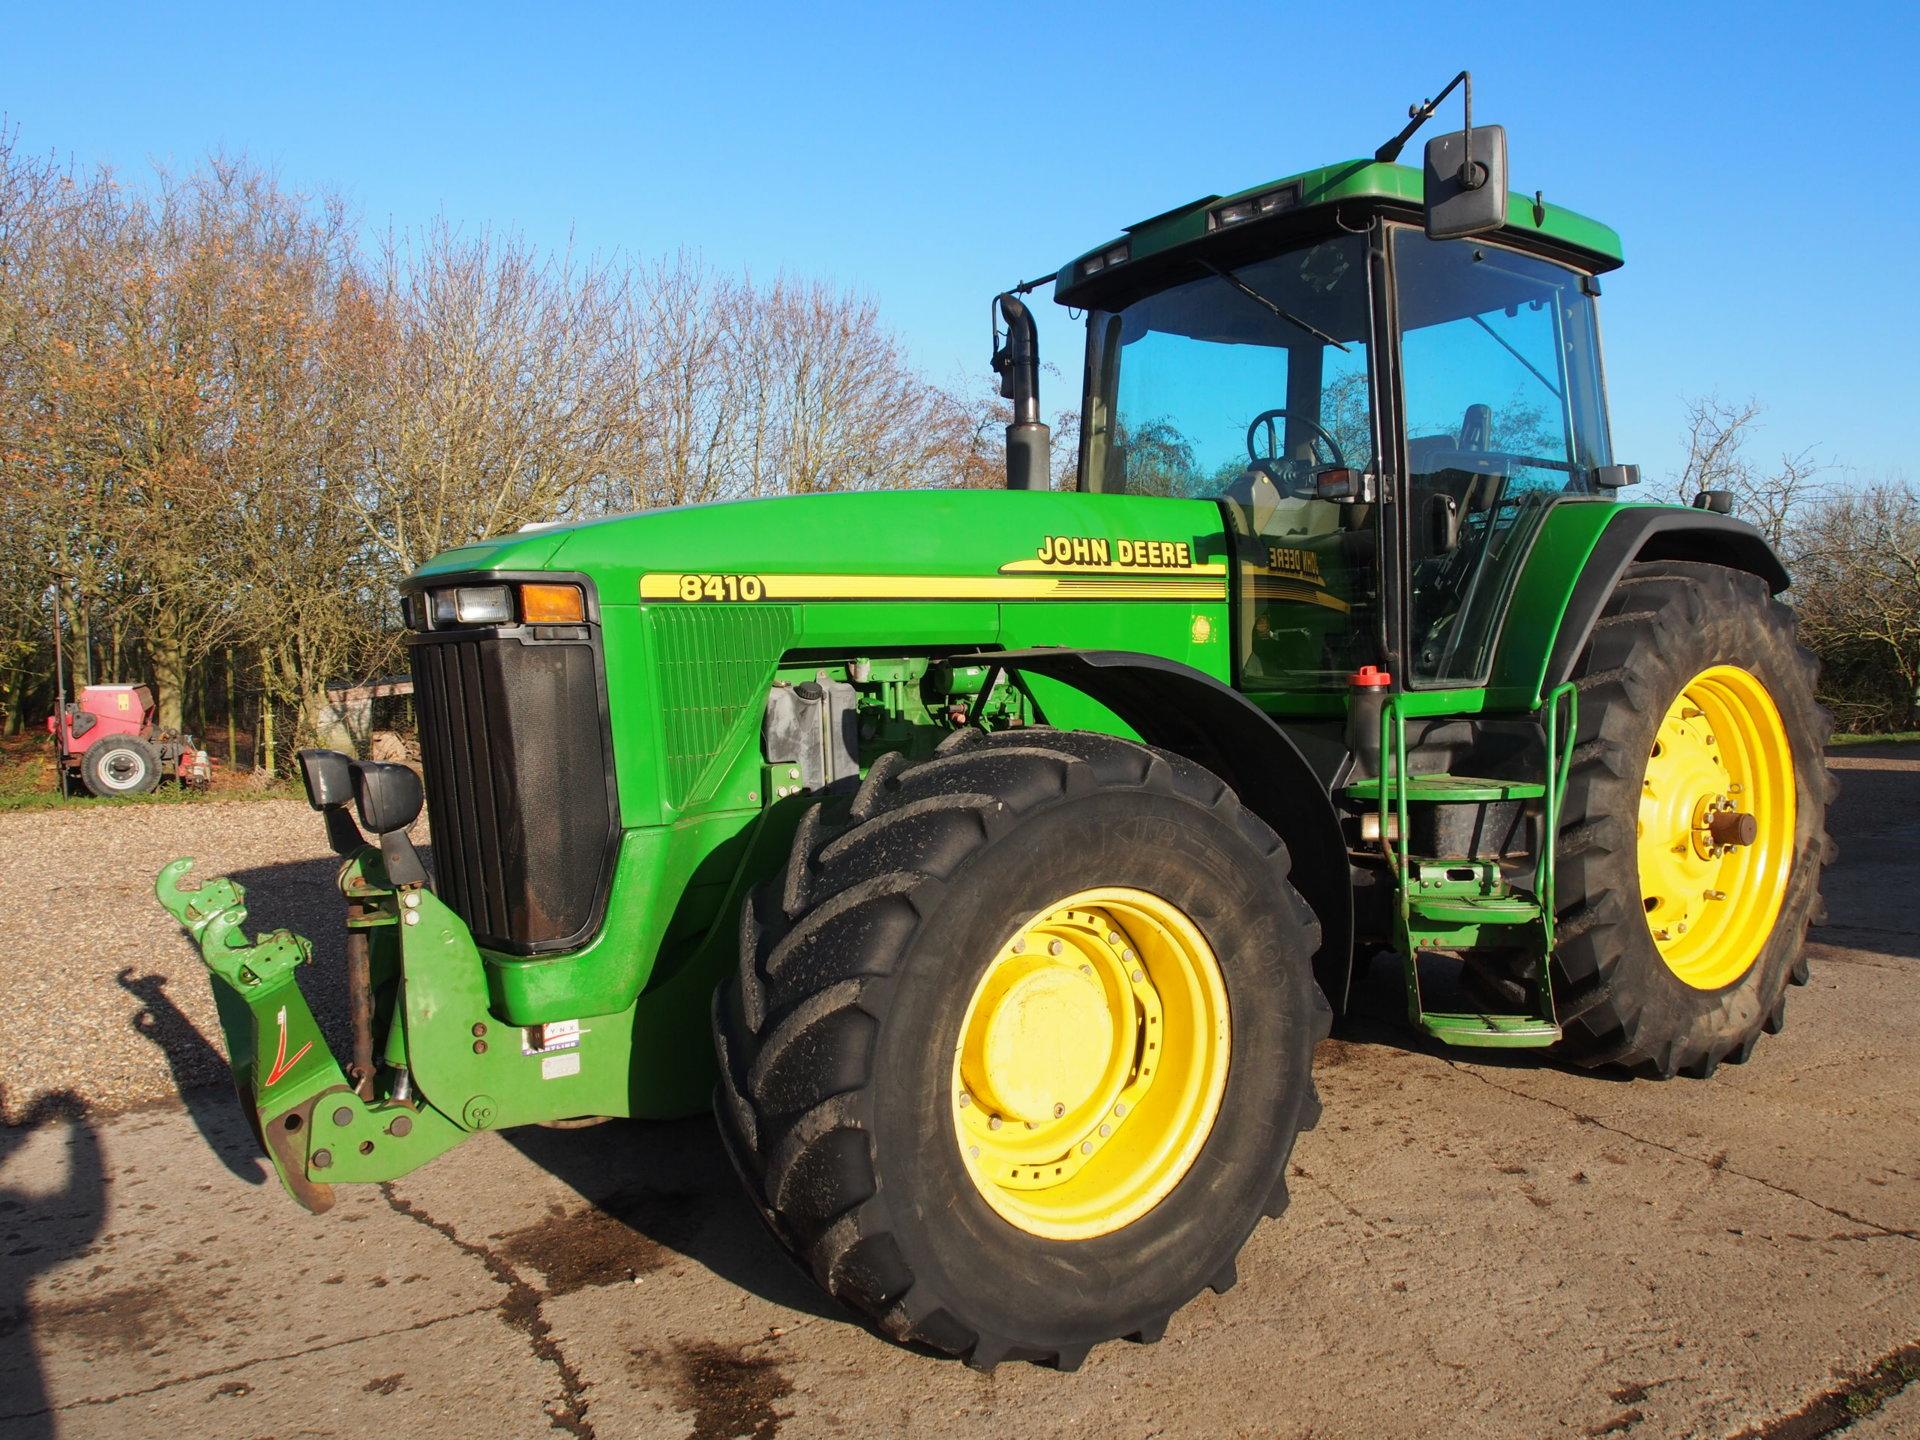 John Deere 8410 The Farming Forum